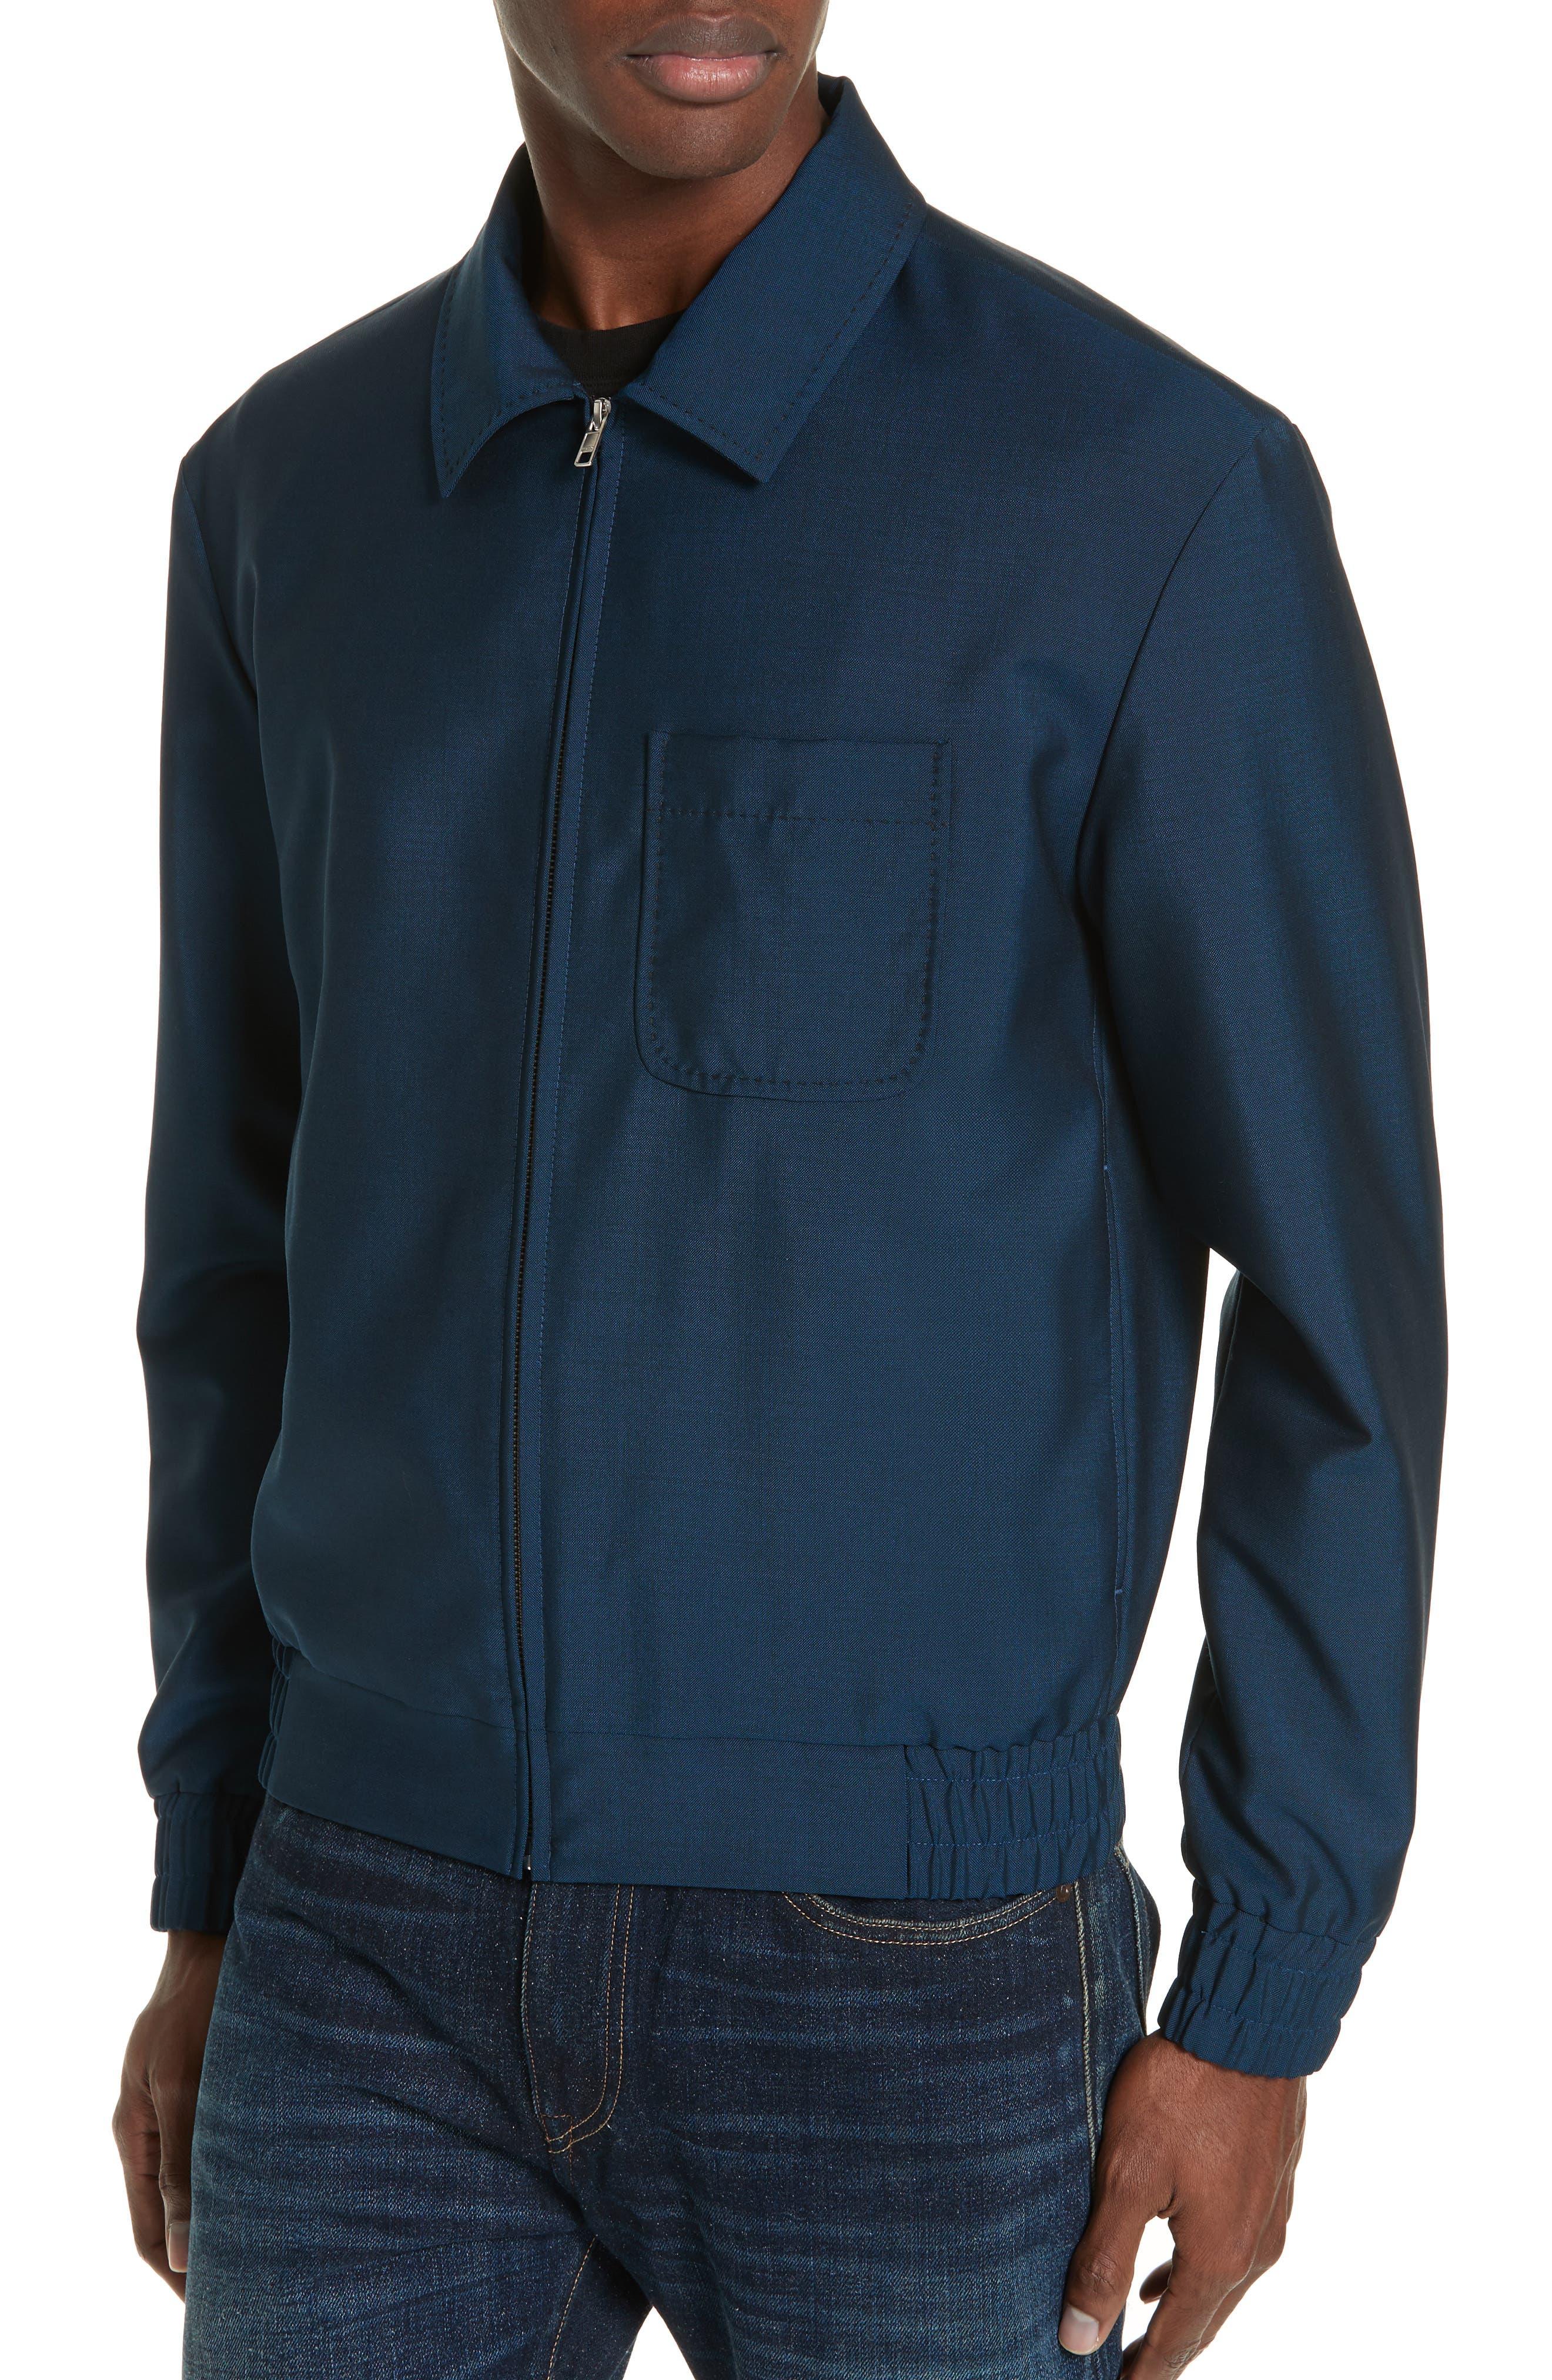 KENZO, Zip Jacket, Alternate thumbnail 4, color, DUCK BLUE